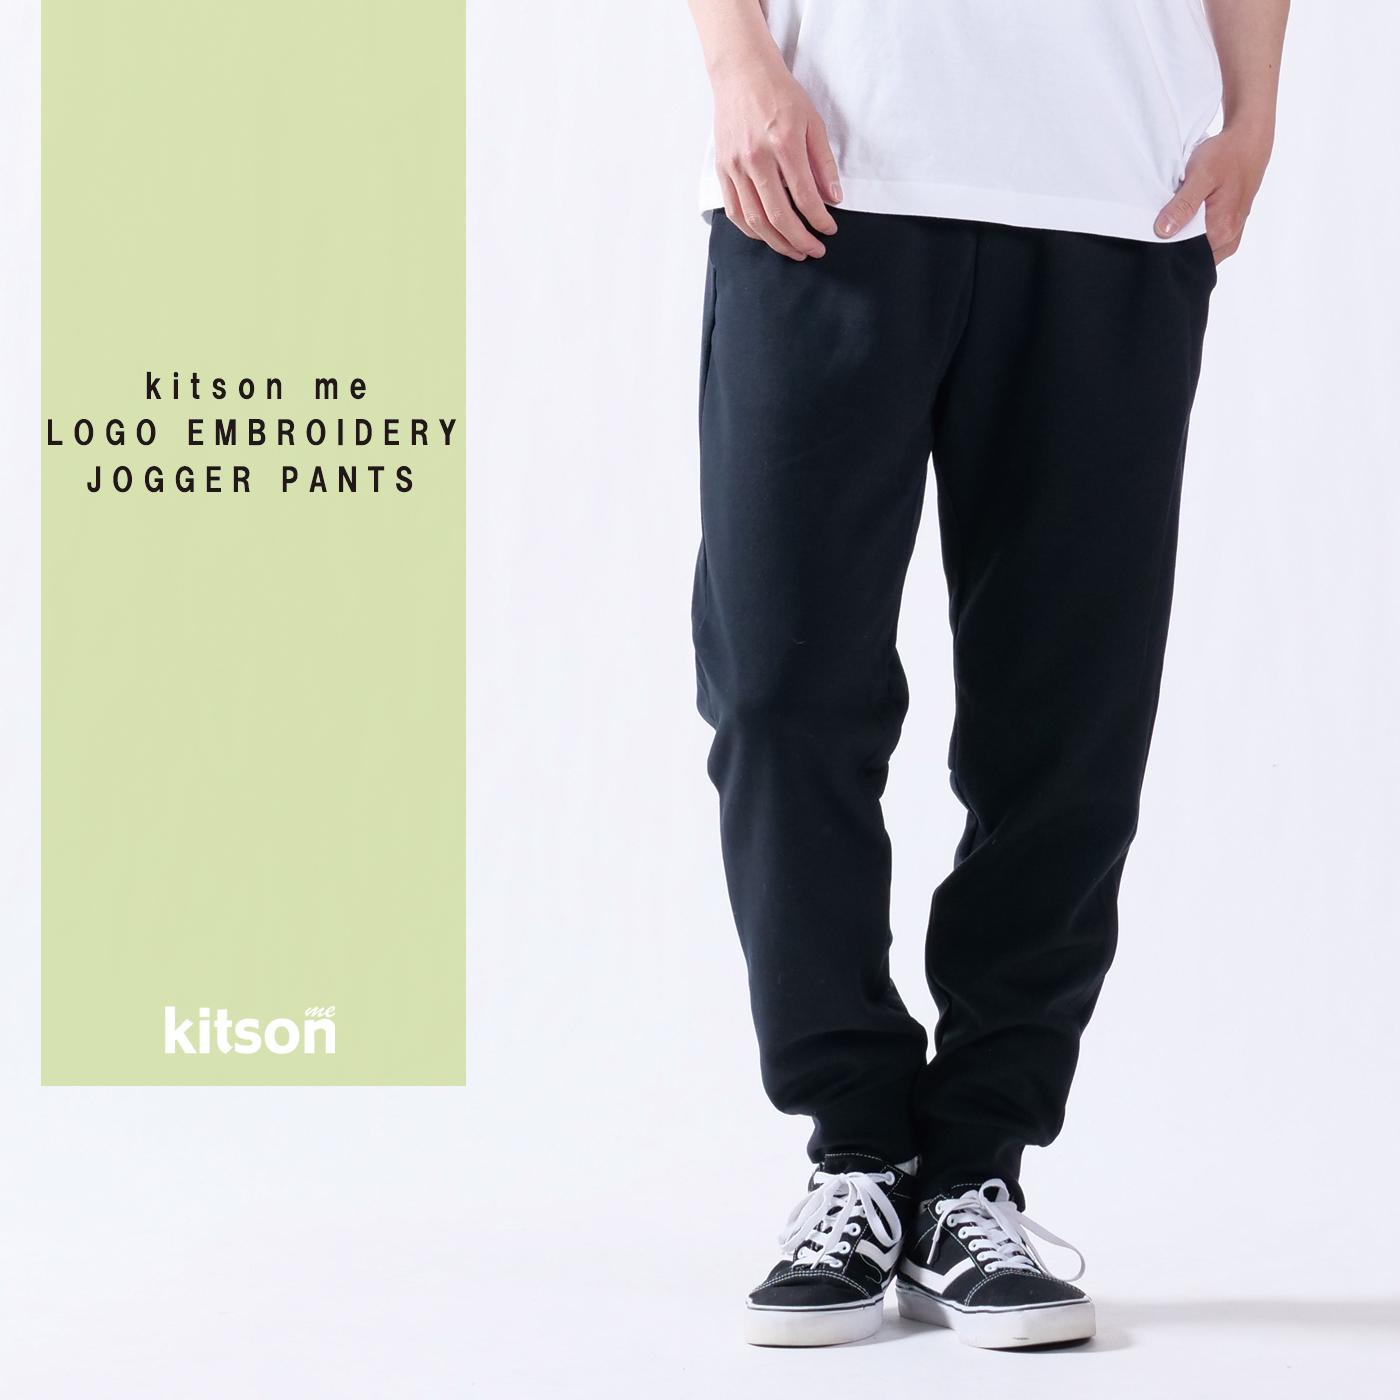 kitson me ロゴ刺繍ジョガーパンツ